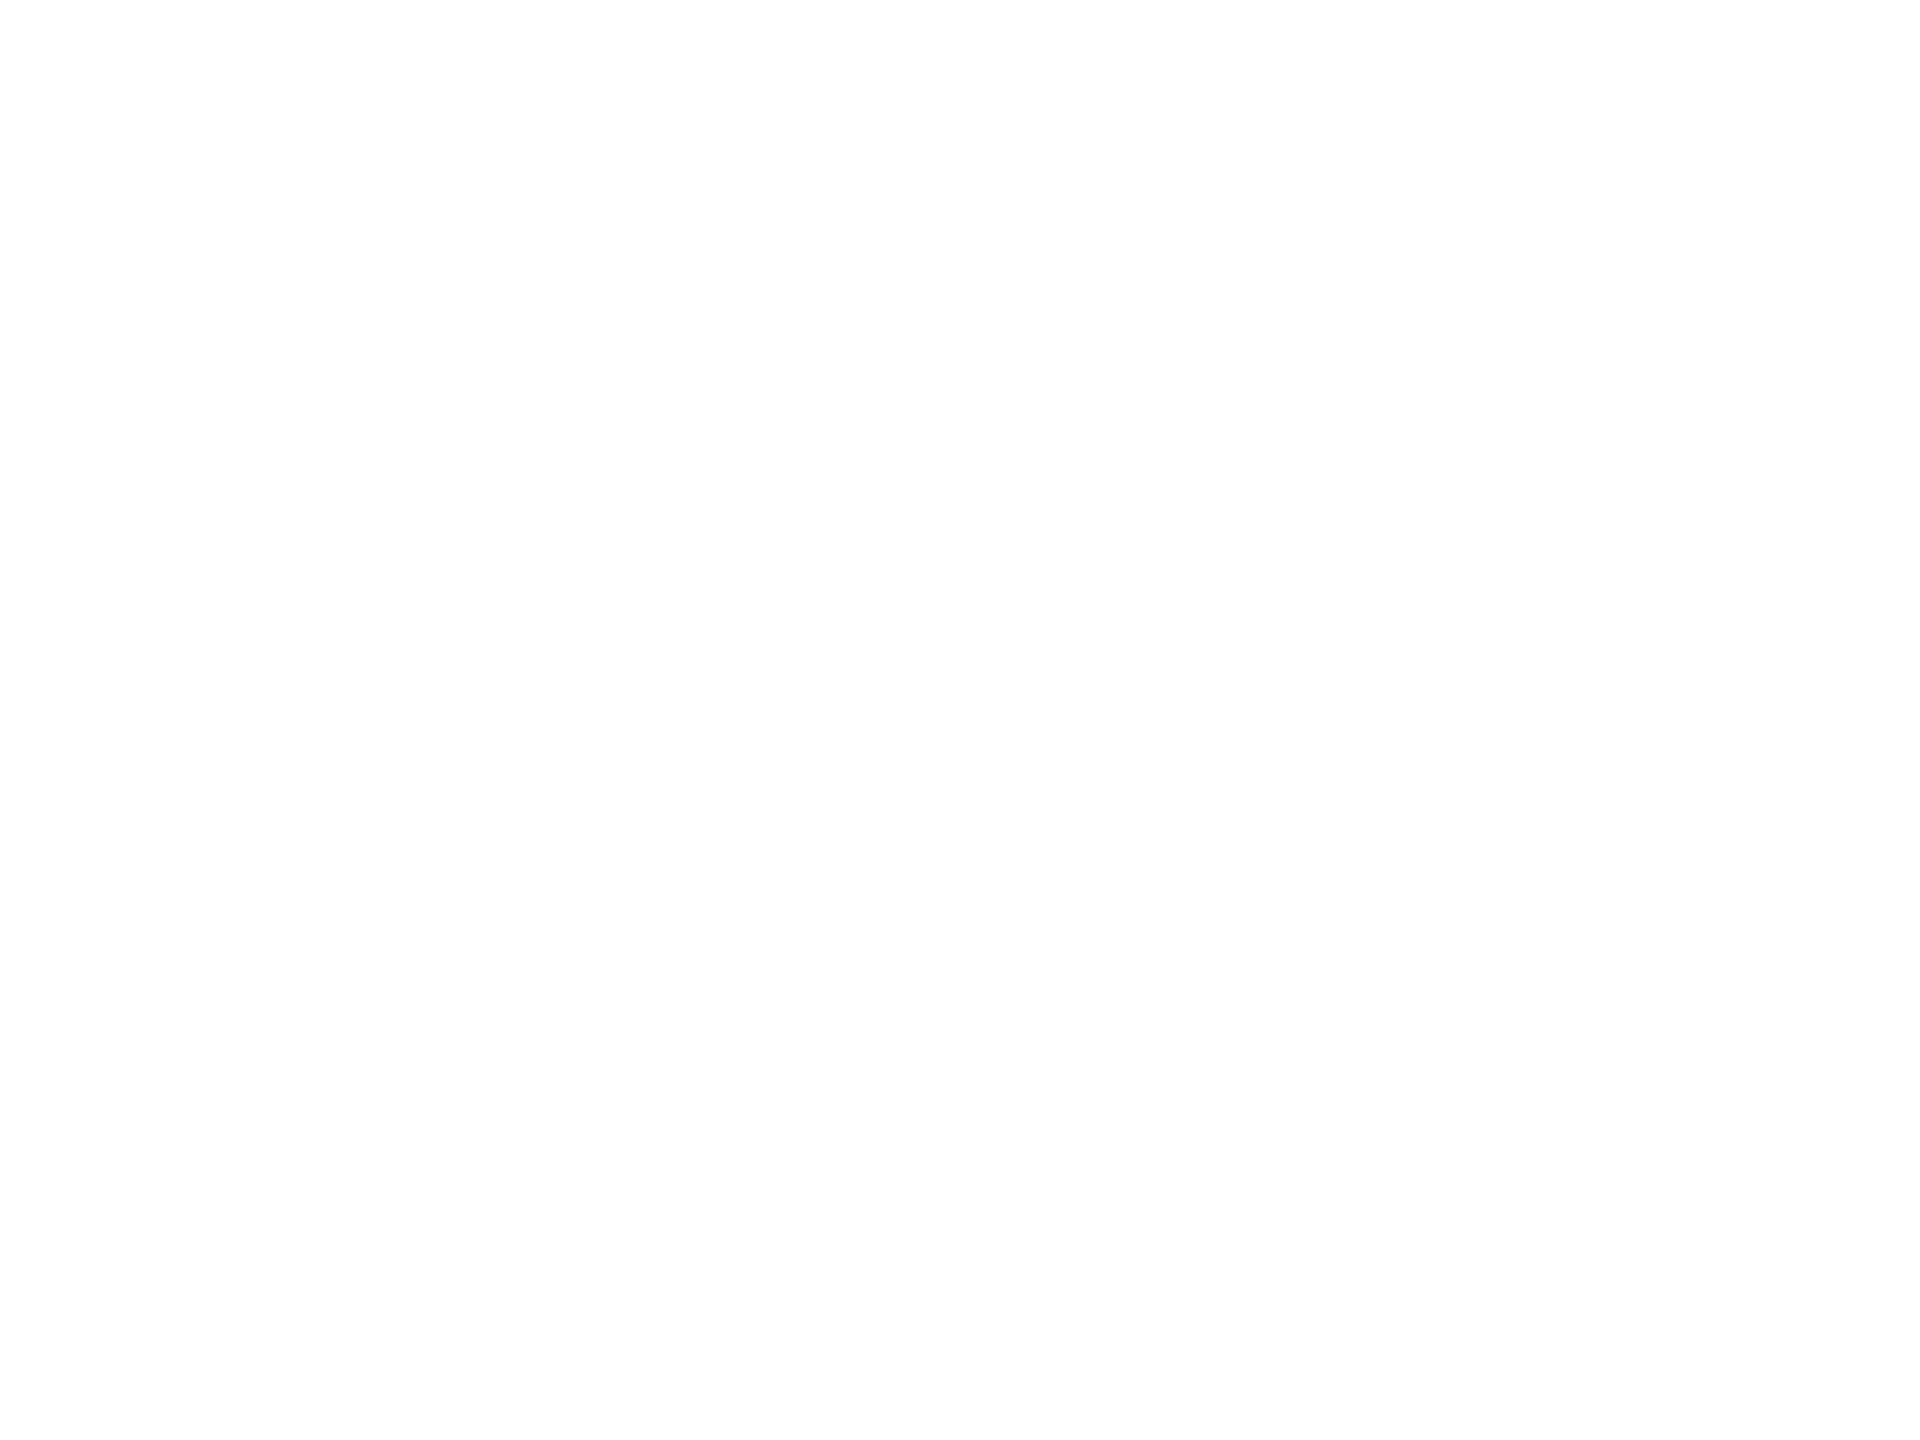 16 Frisco Best Hair salon AALAM Salon Plano Frisco North Dallas TX Best Hair salon Top Hair Colorist Master Stylist Salons Allen McKinney Addison DFW Upscale High End Men Women Mens Haircut Balayage Blow Dry Bar LUXBAR AALAM 1